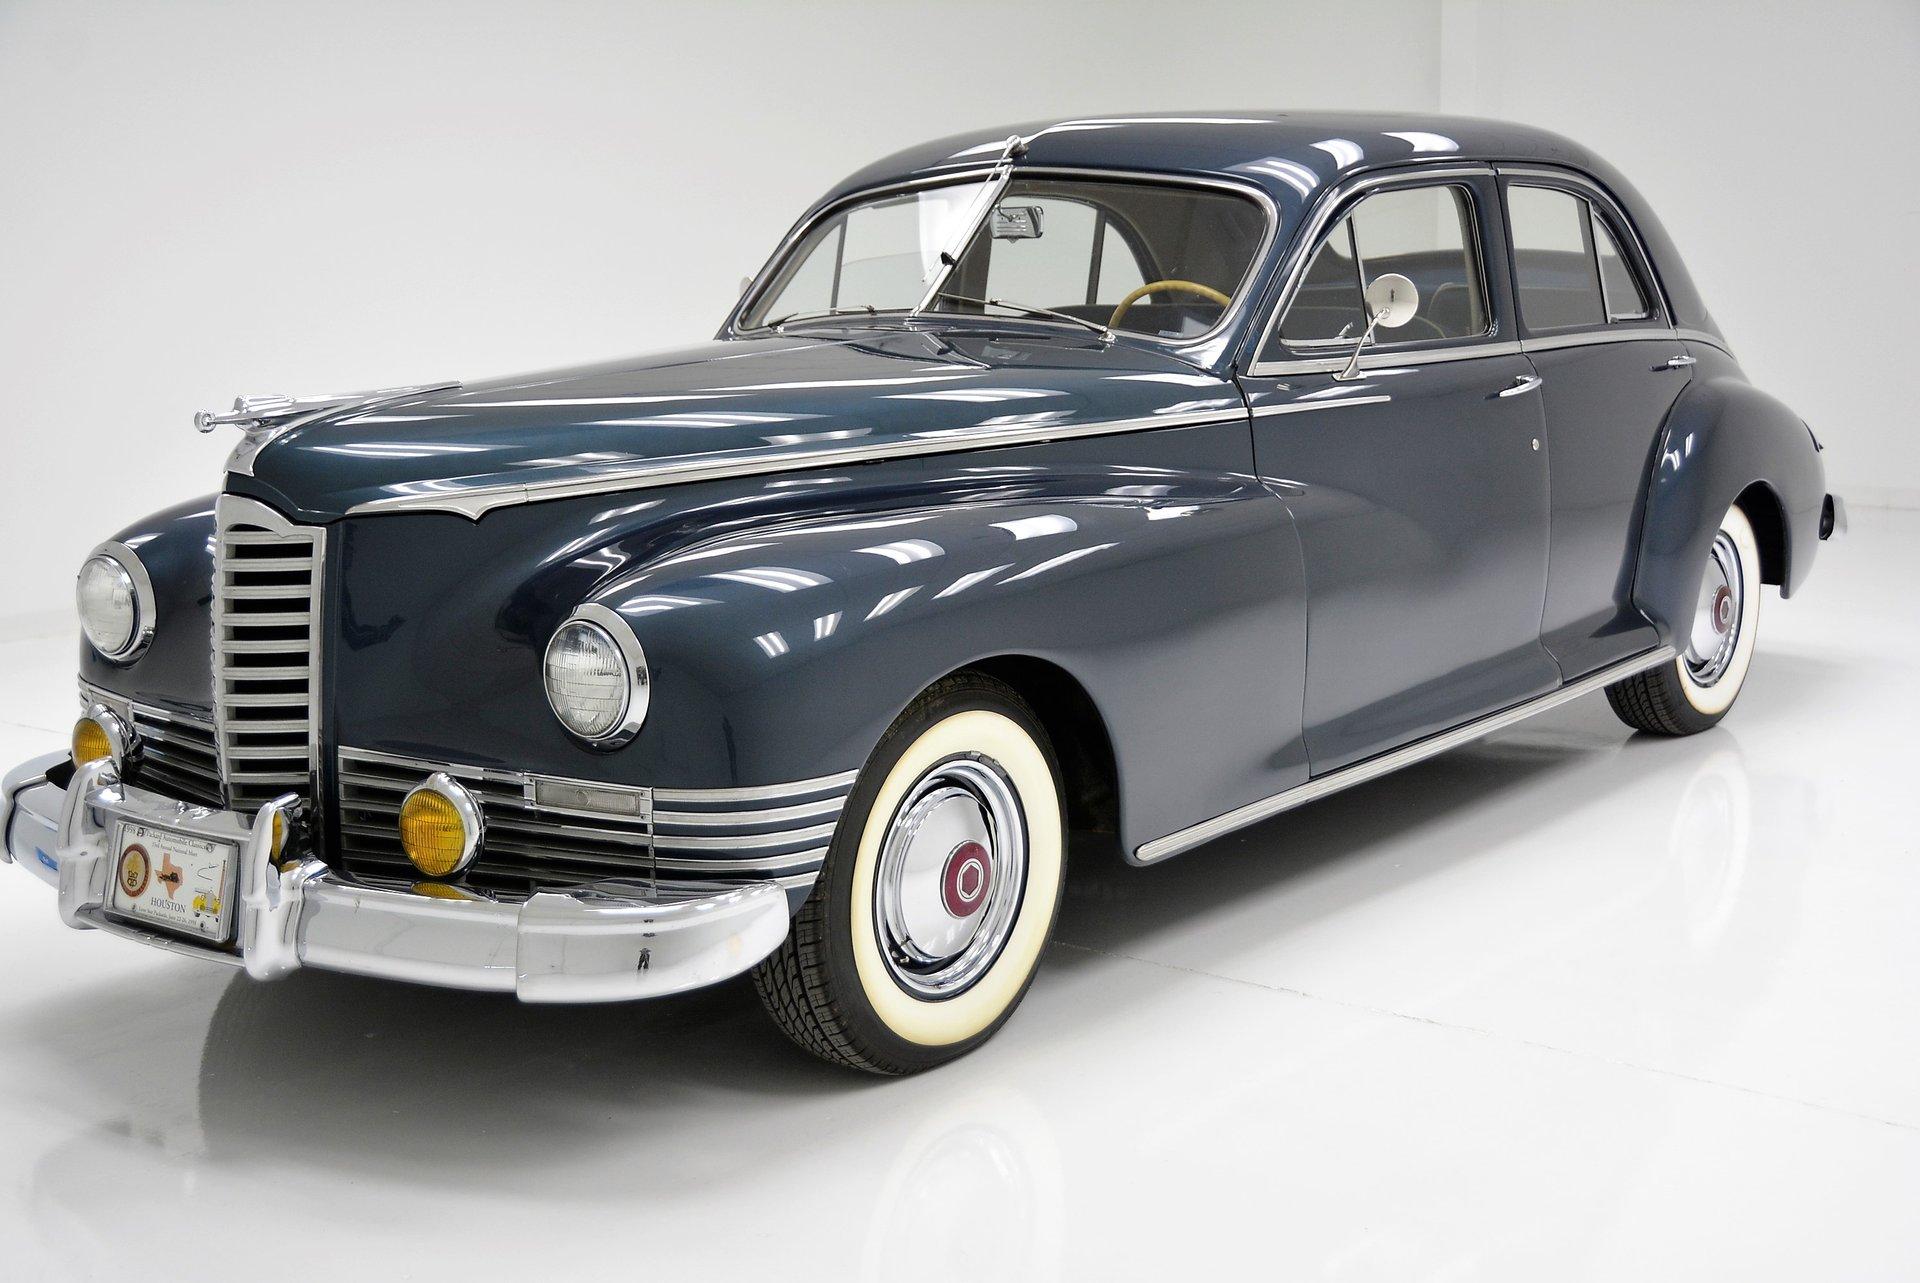 1947 Packard Super Clipper Sedan